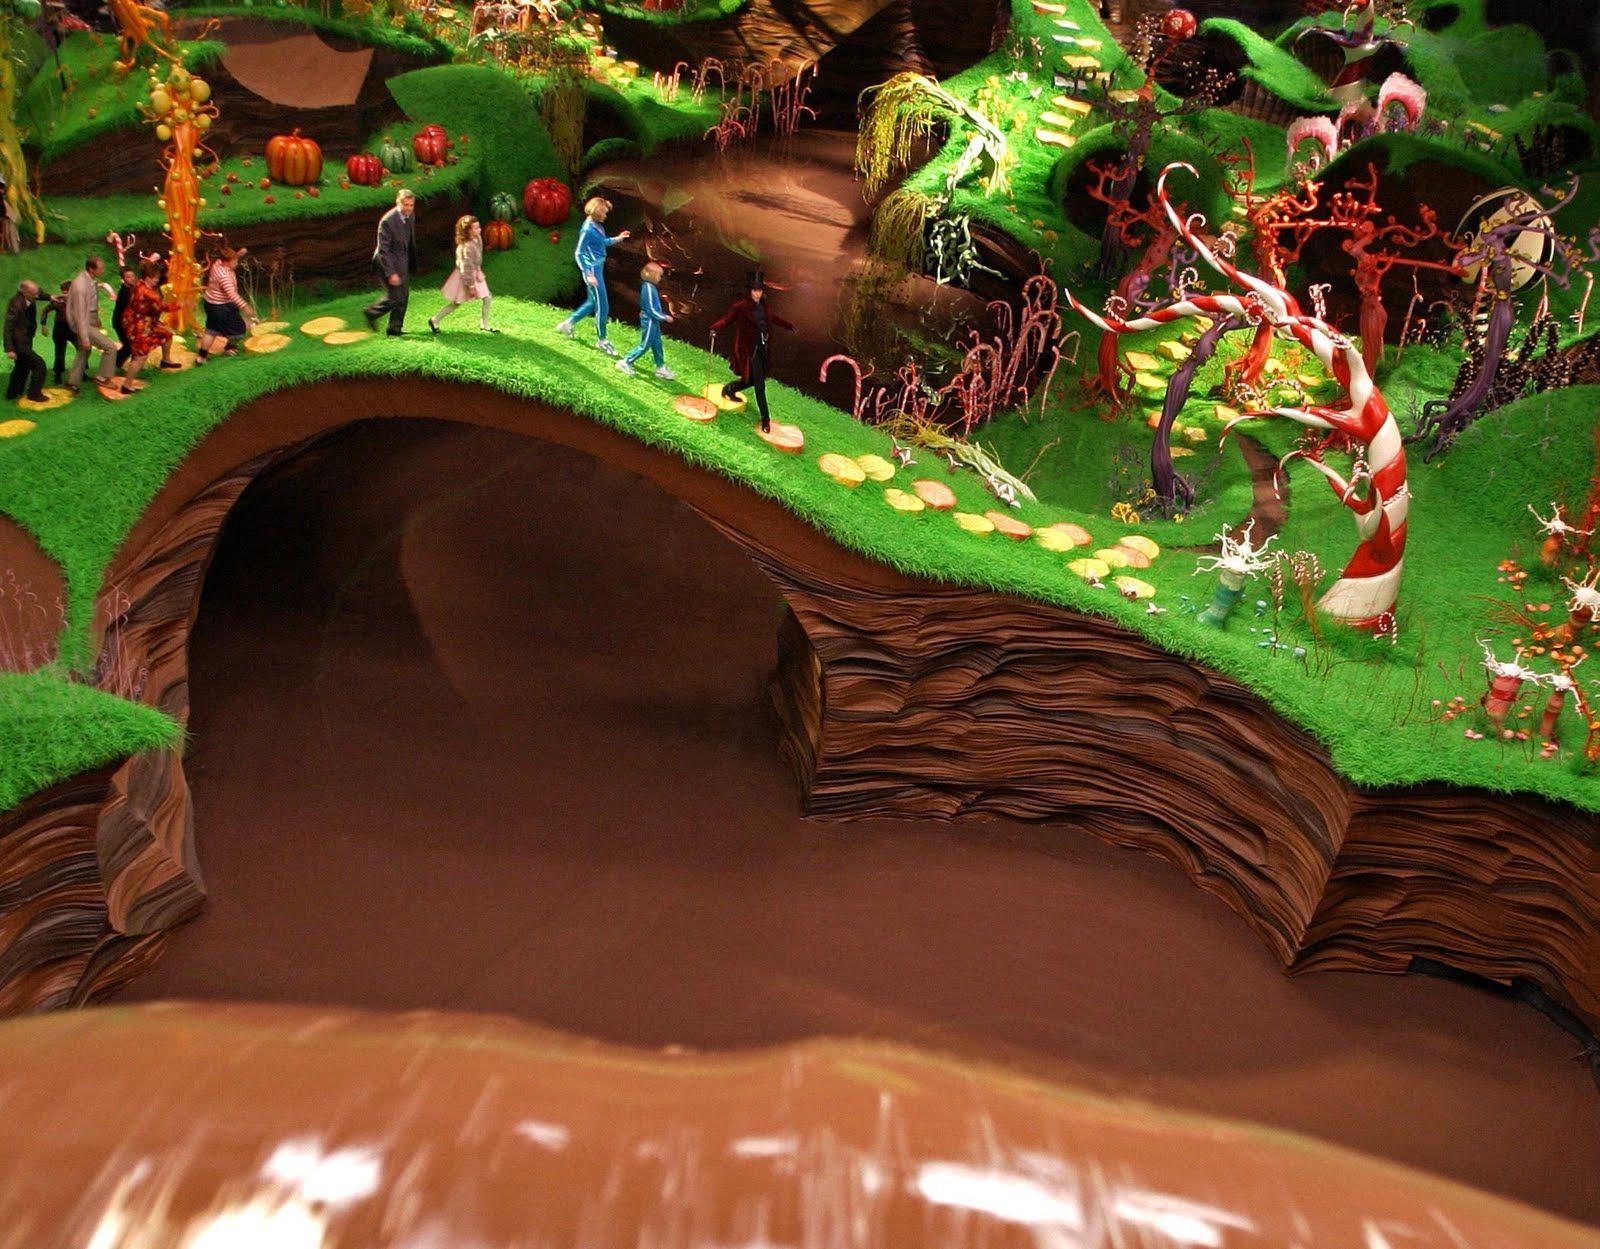 A Chocolate Factory In Wood Green Fabrica De Chocolate